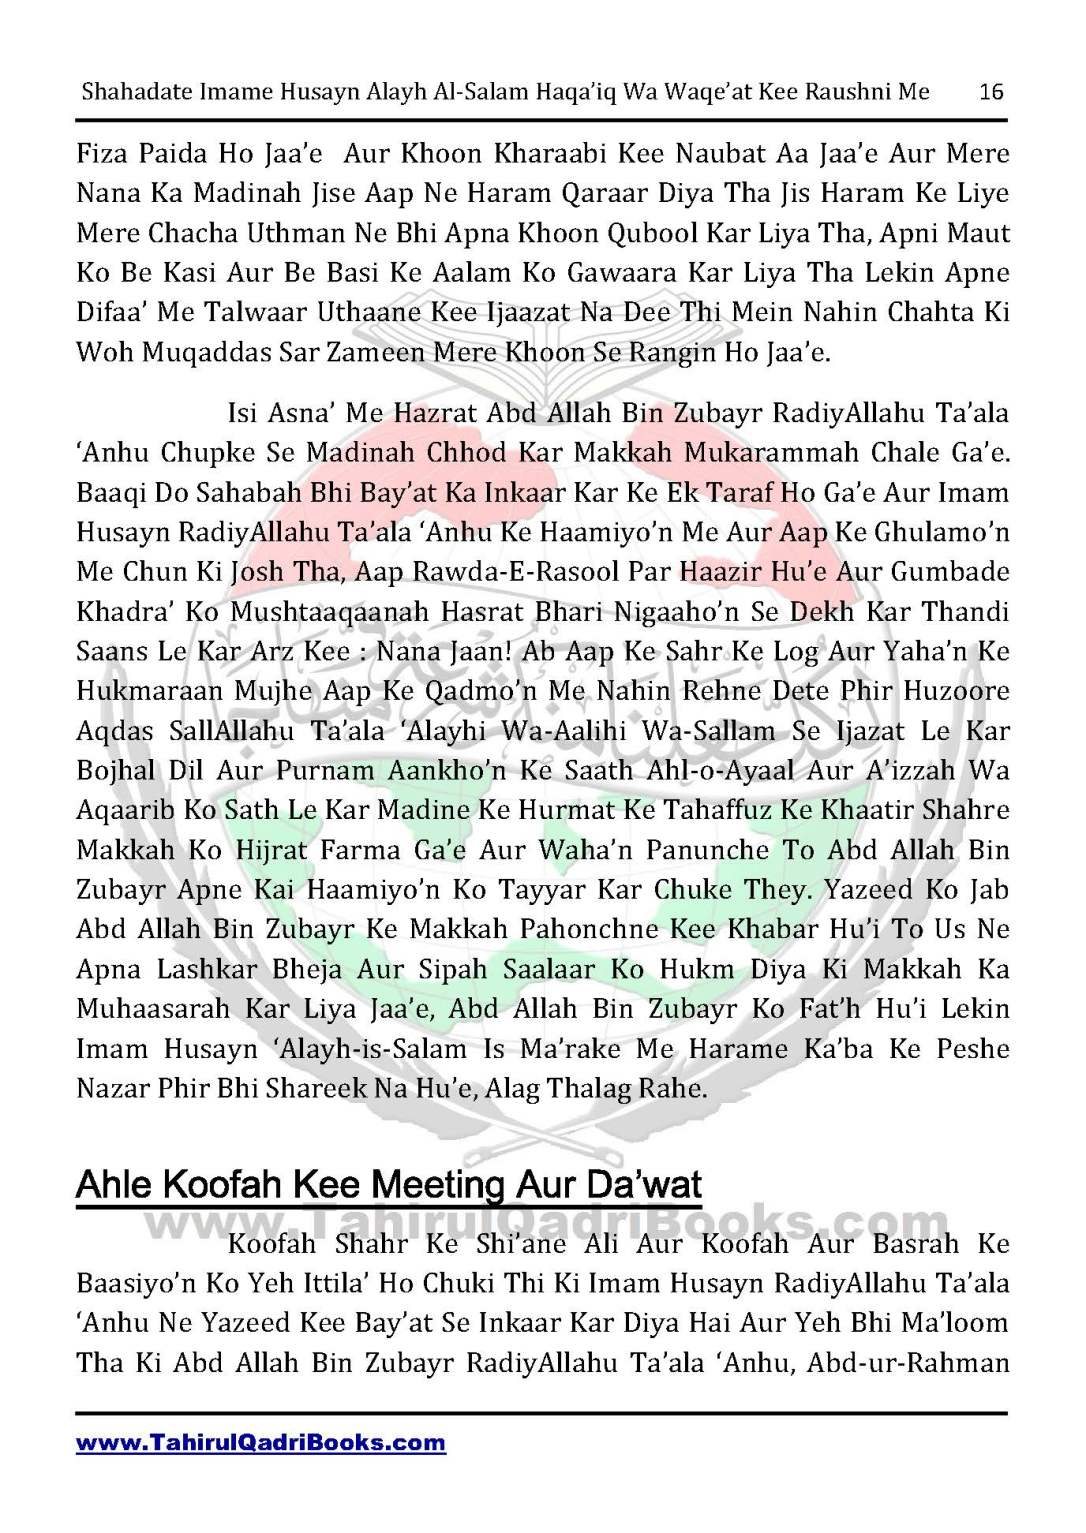 shahadate-imame-husayn-alayh-is-salam-haqaiq-wa-waqe_at-kee-raushni-me-in-roman-urdu-unlocked_Page_16